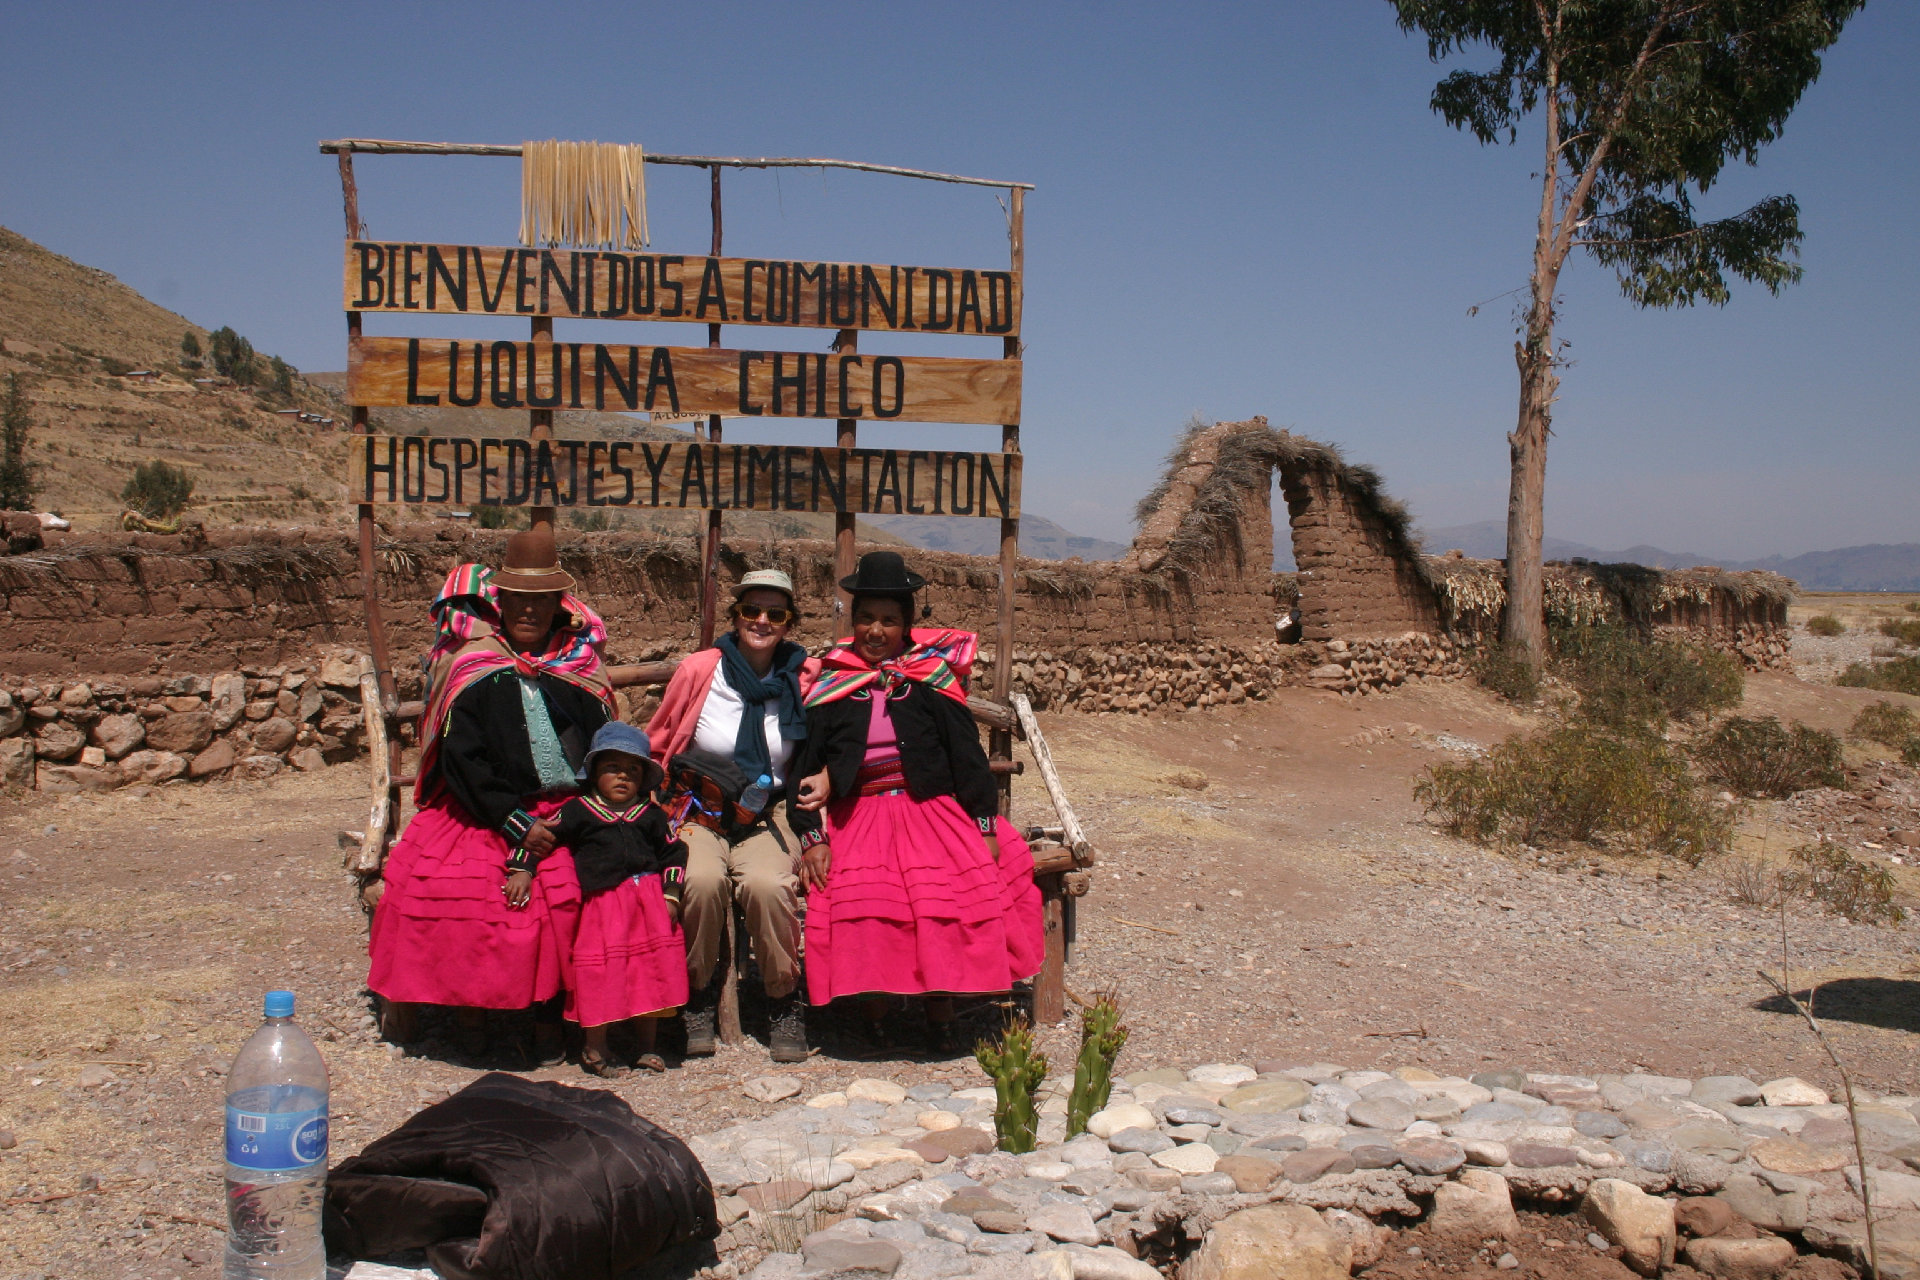 Luquina Chico Community Based Tourism, Aracari Travel